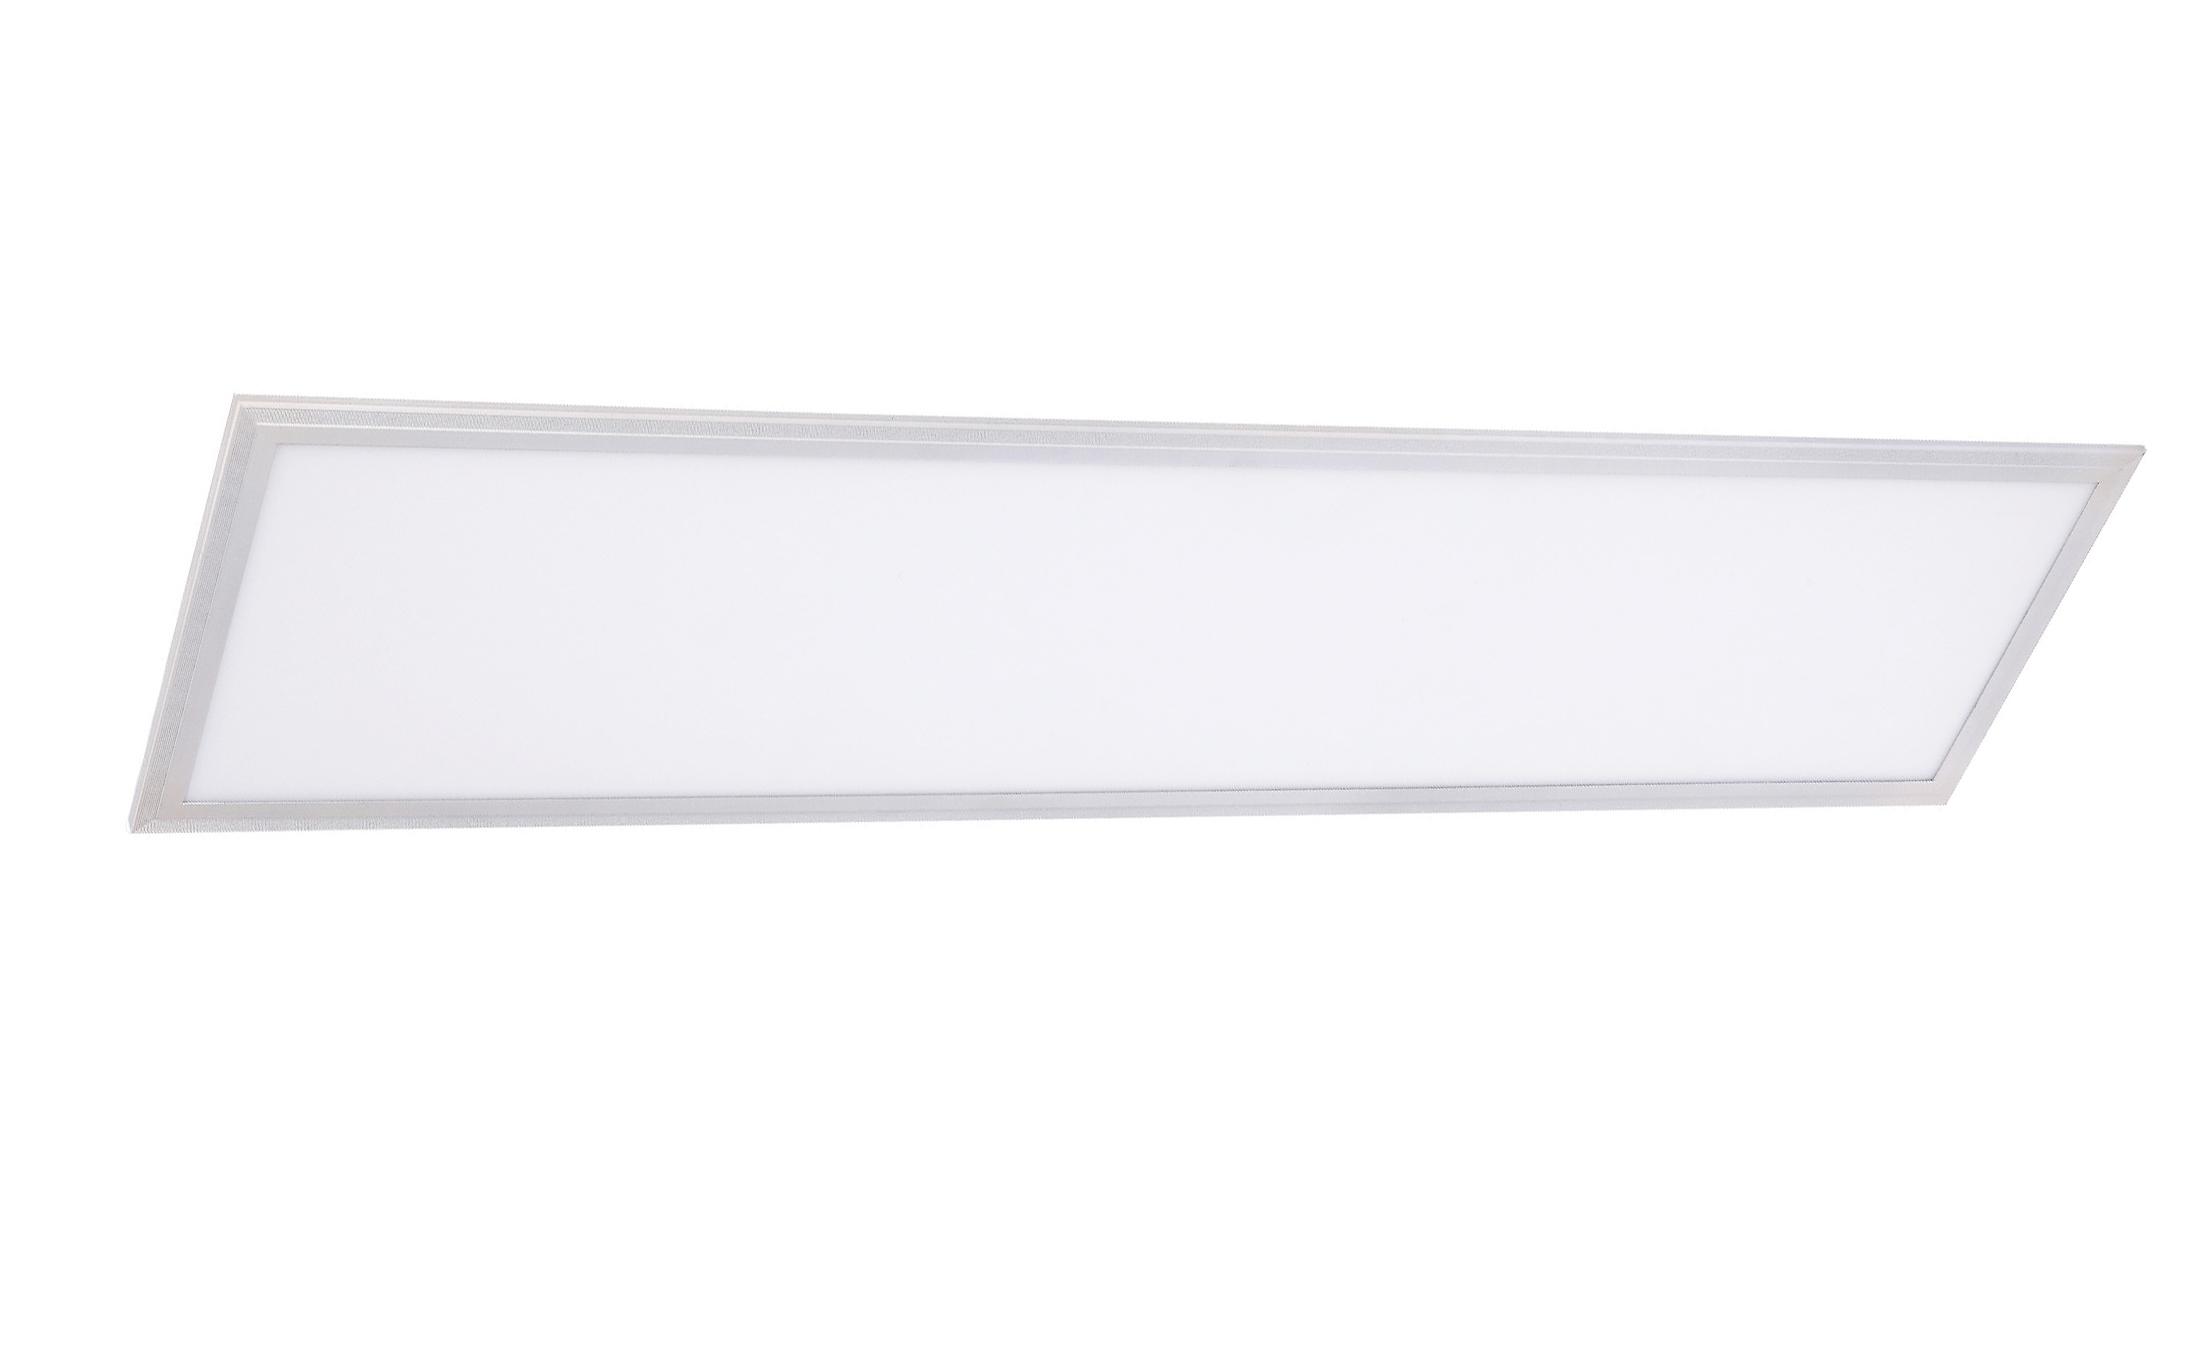 eSkylight LED Panel Lamp - 17050035